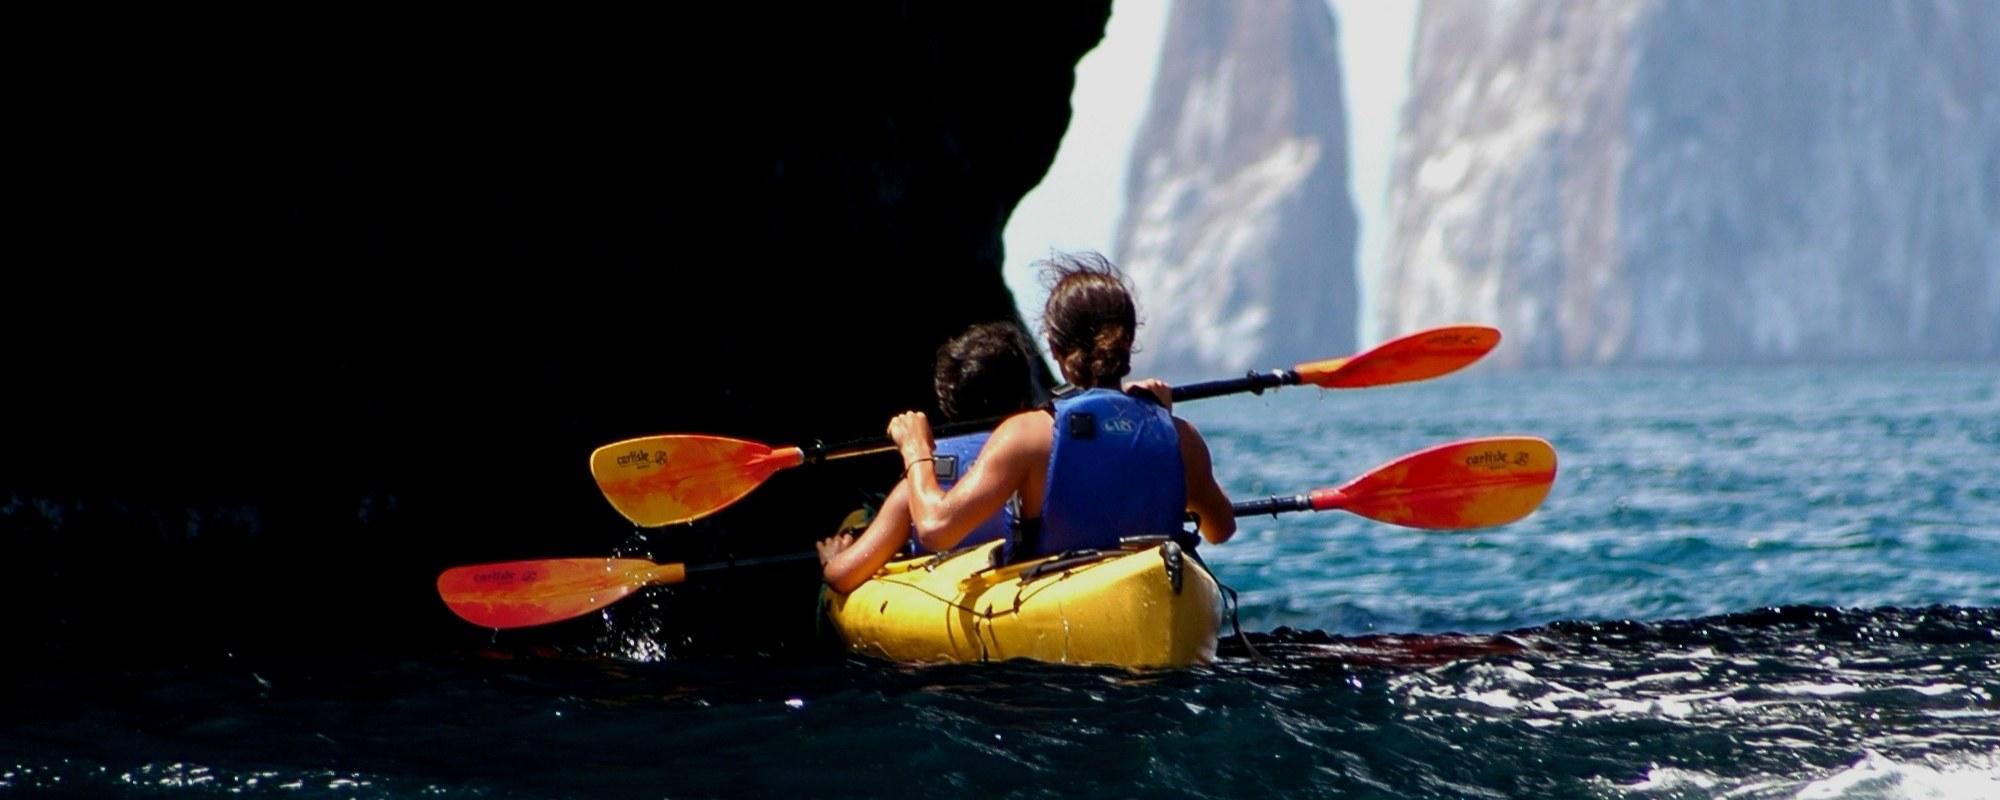 Kayaking near Kicker Rock